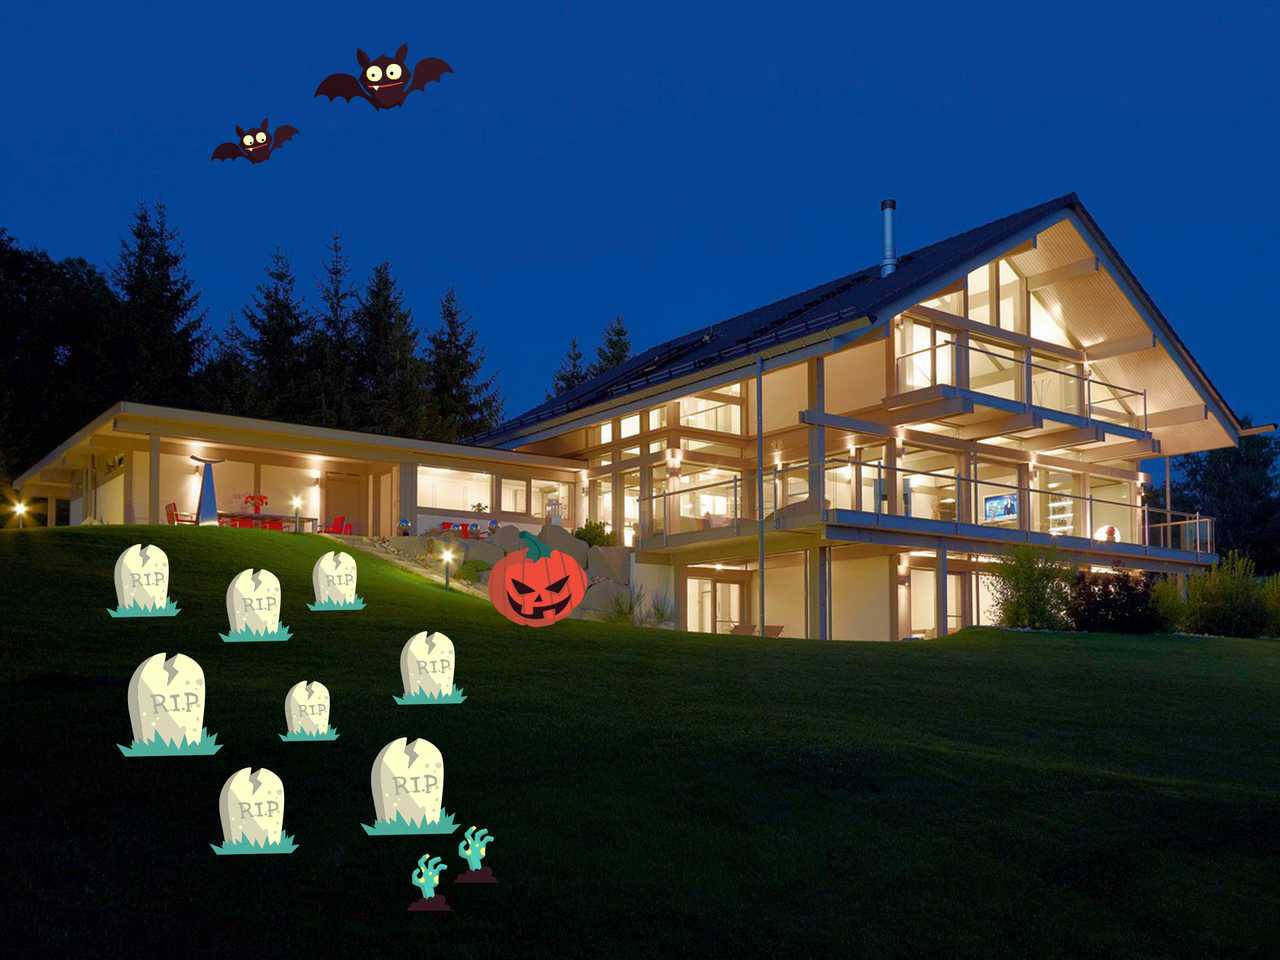 HUF Haus ART 5 Projektbeispiel 2 Halloween